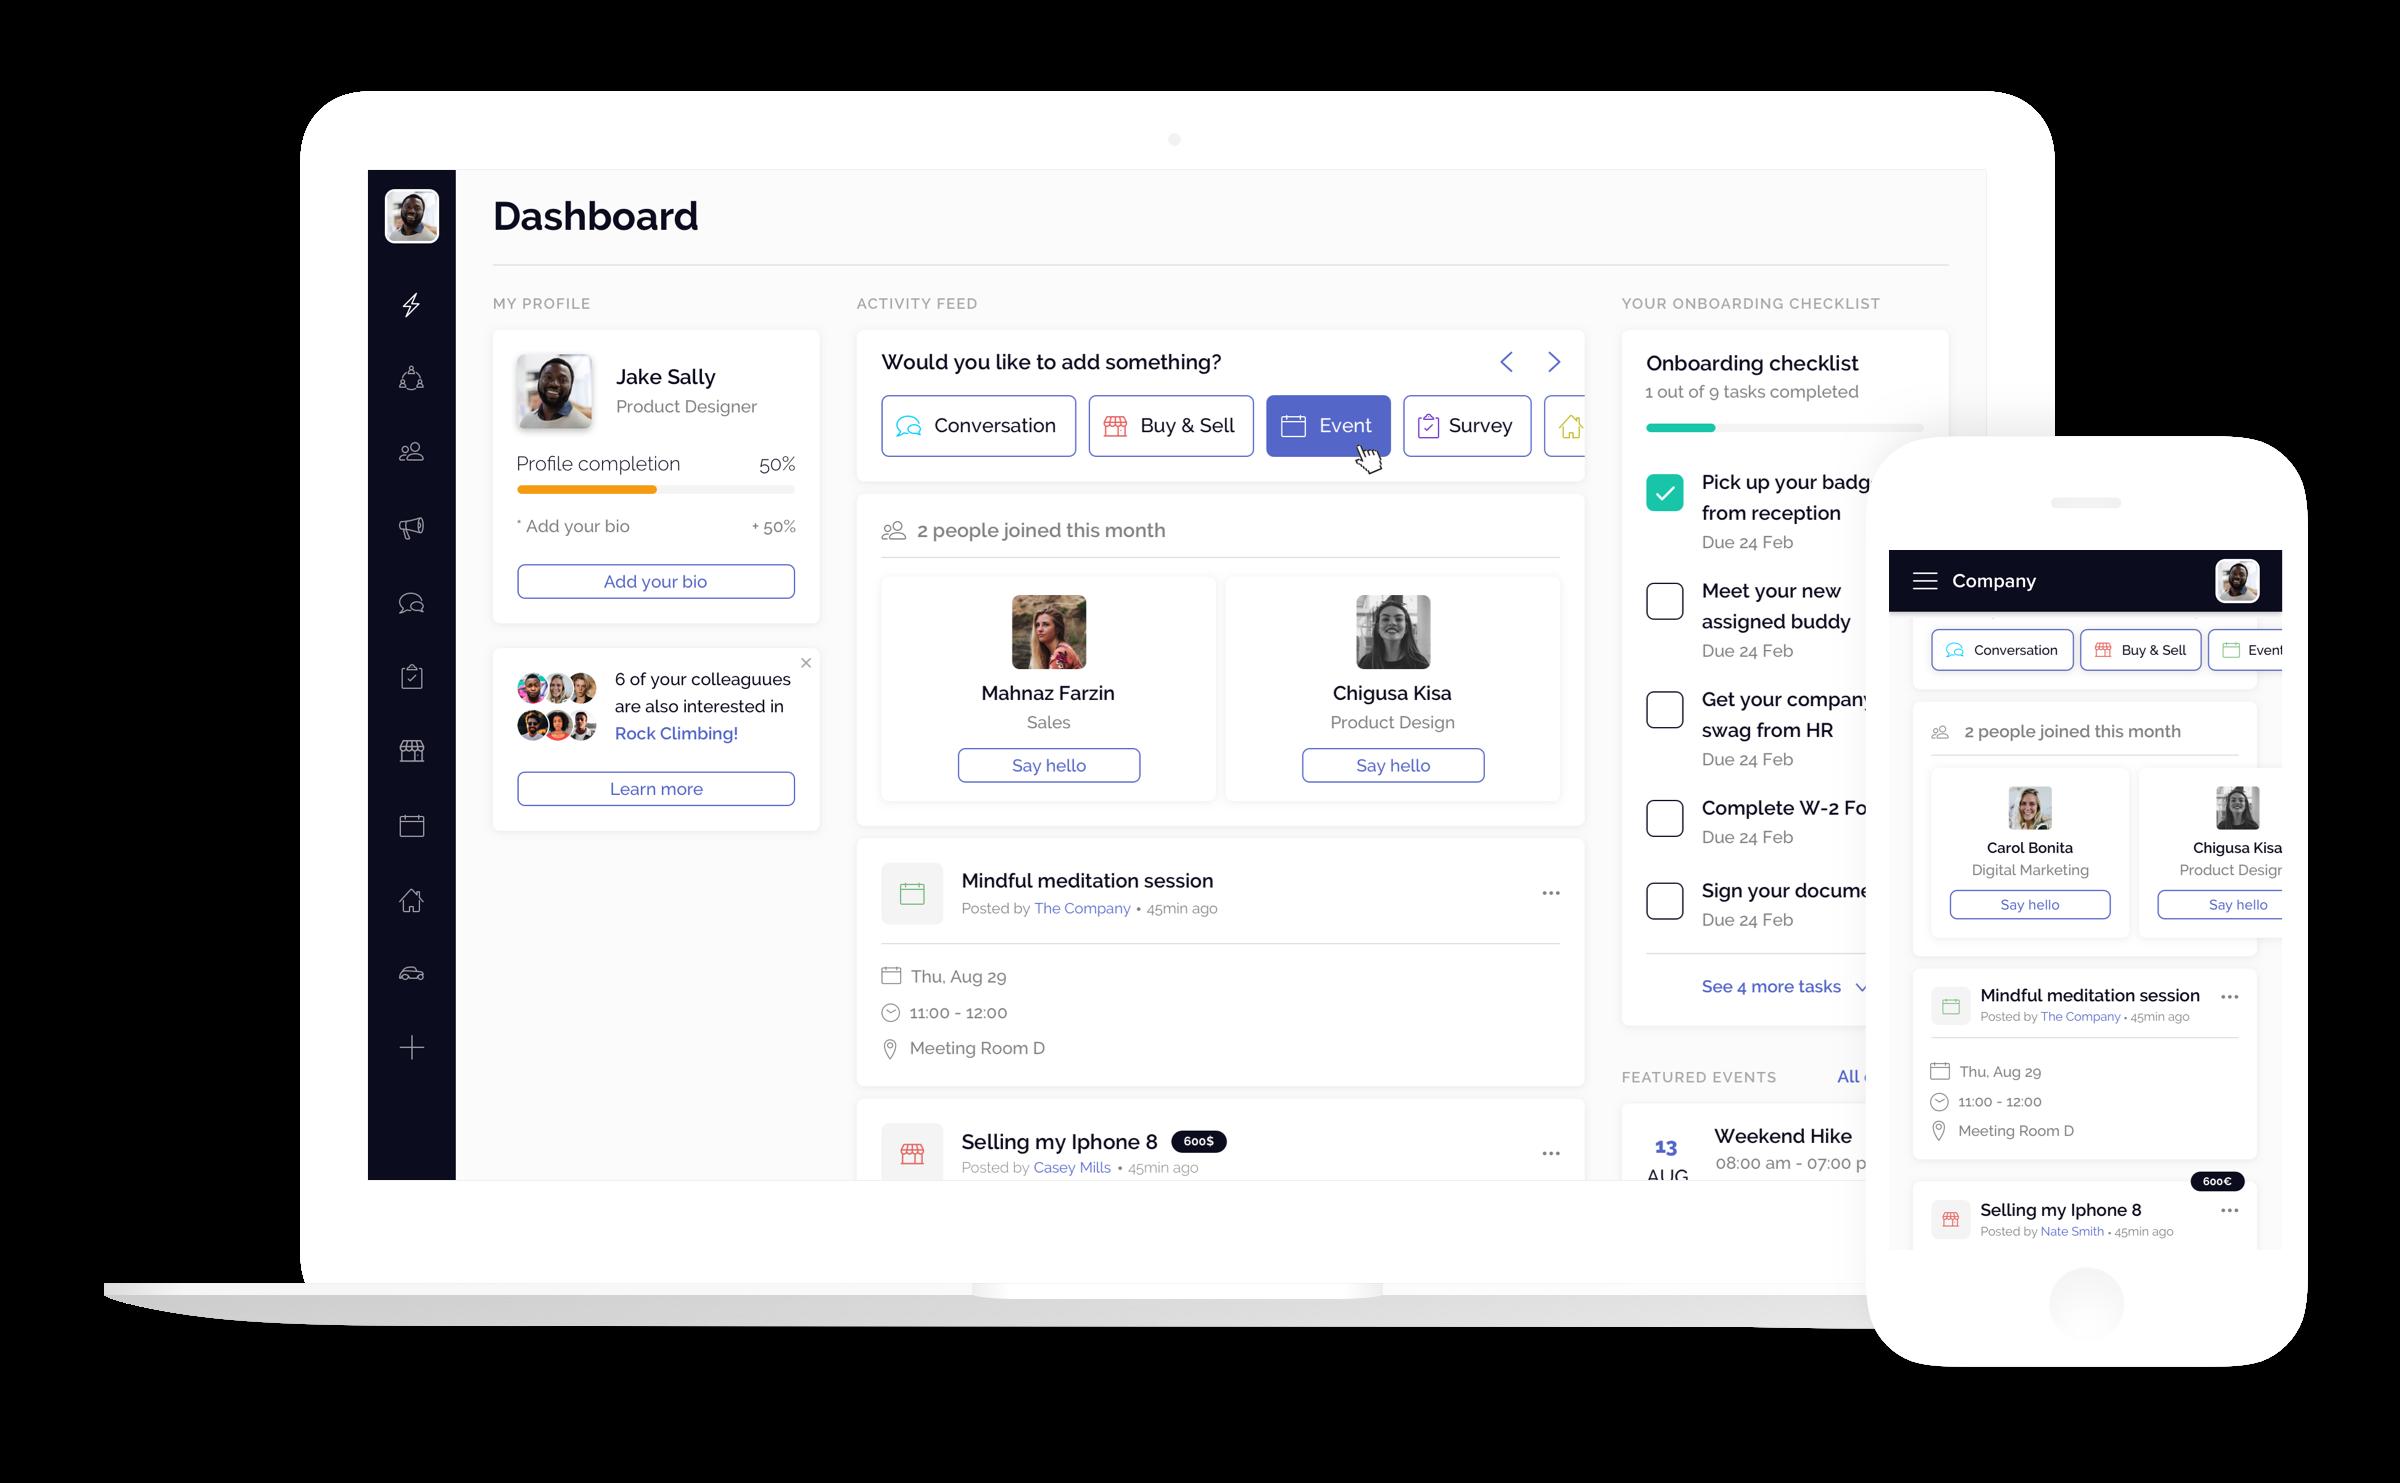 Office Accord platform on desktop and mobile